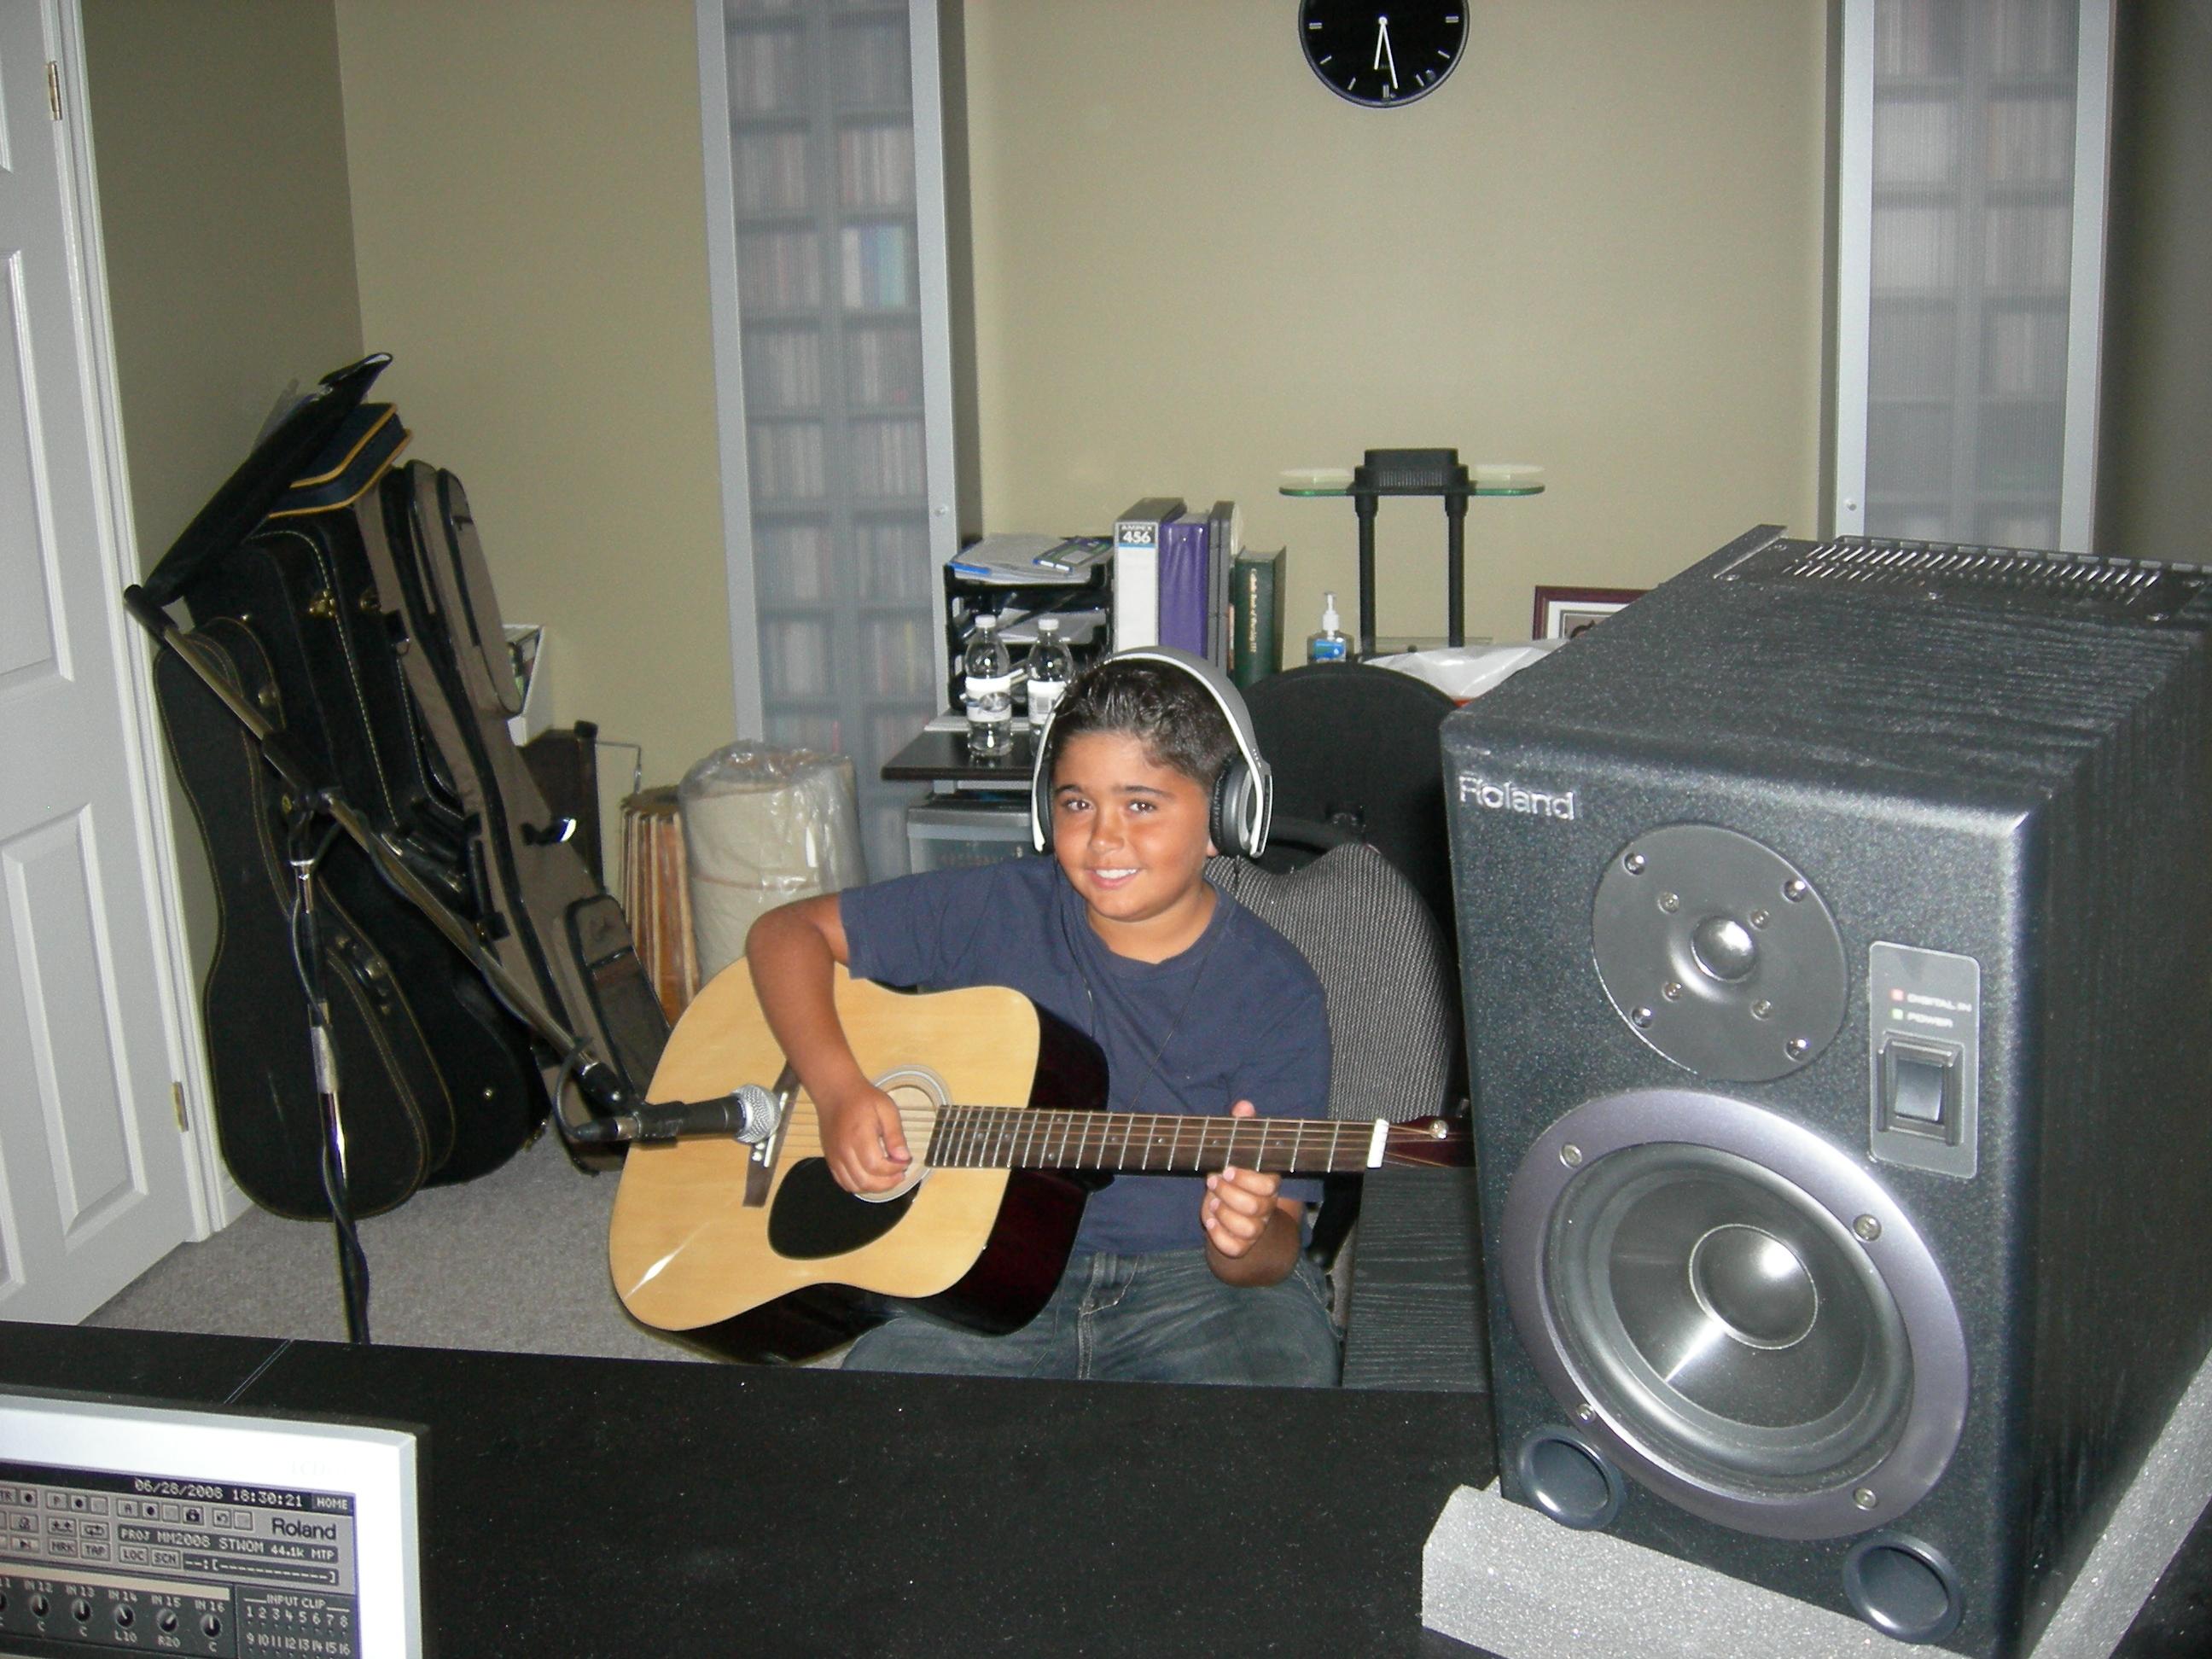 200806 Musik Miks Session 3 -  Amir 001